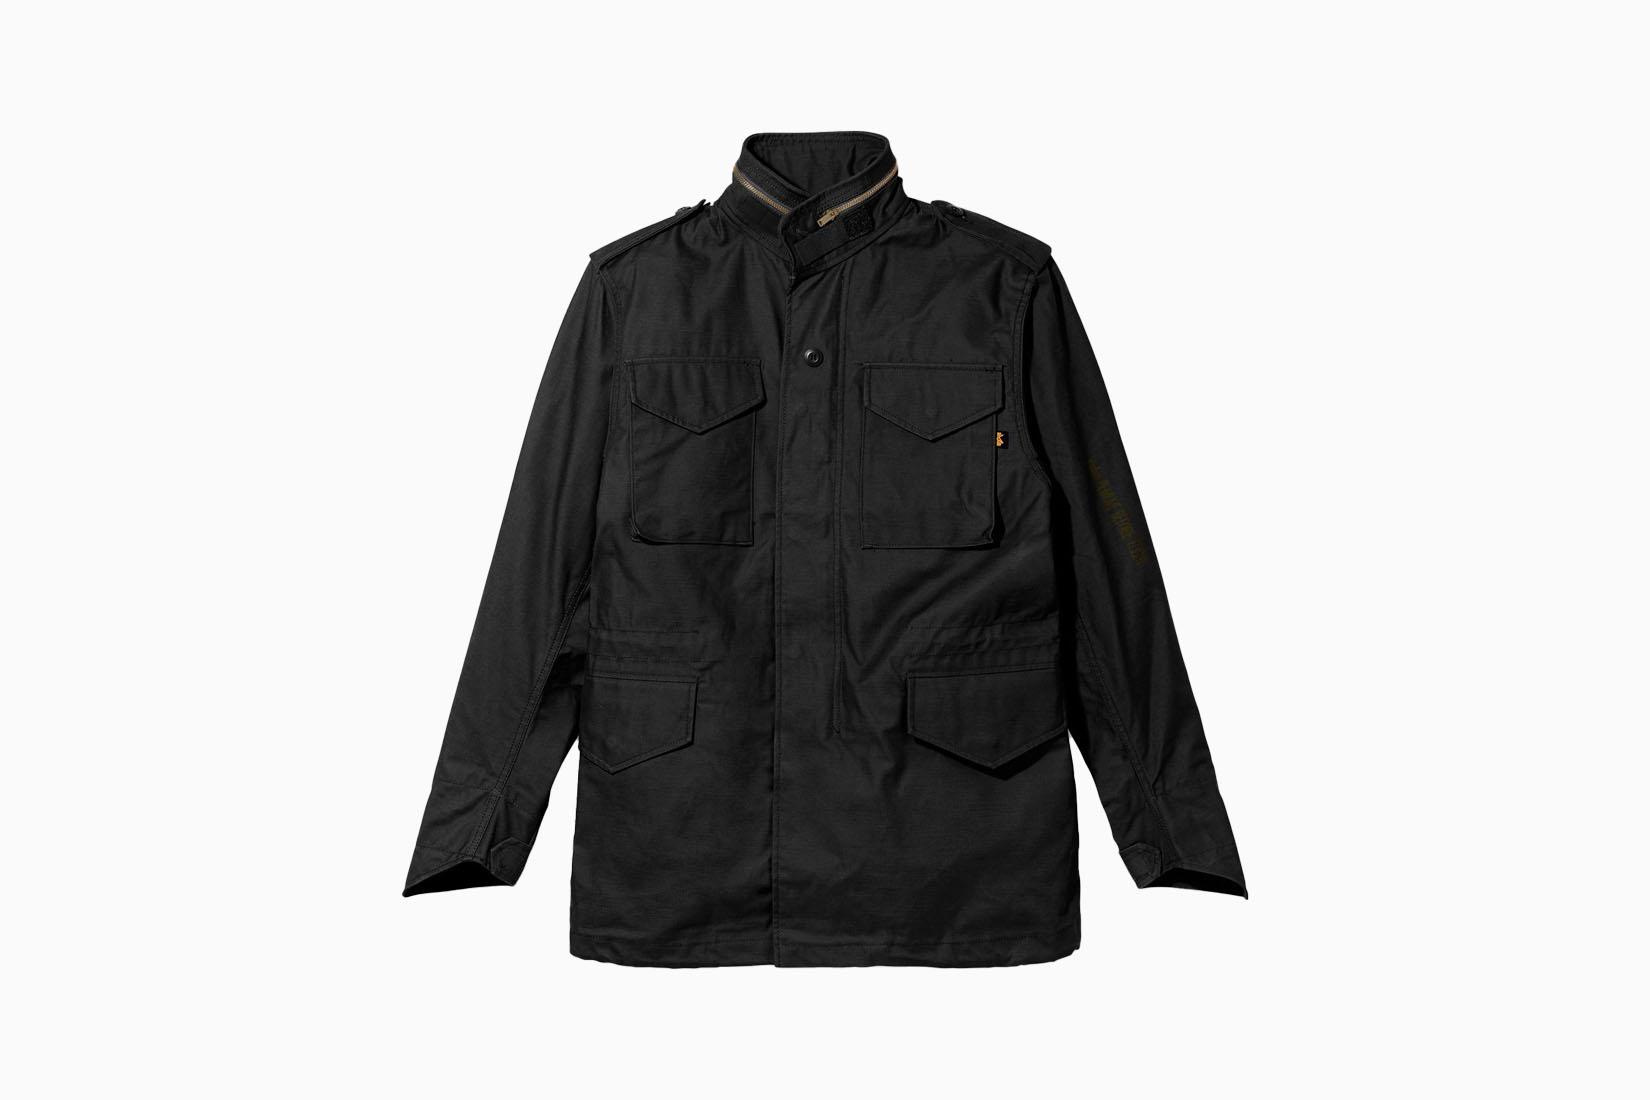 best men field jackets alpha industries m 65 review Luxe Digital